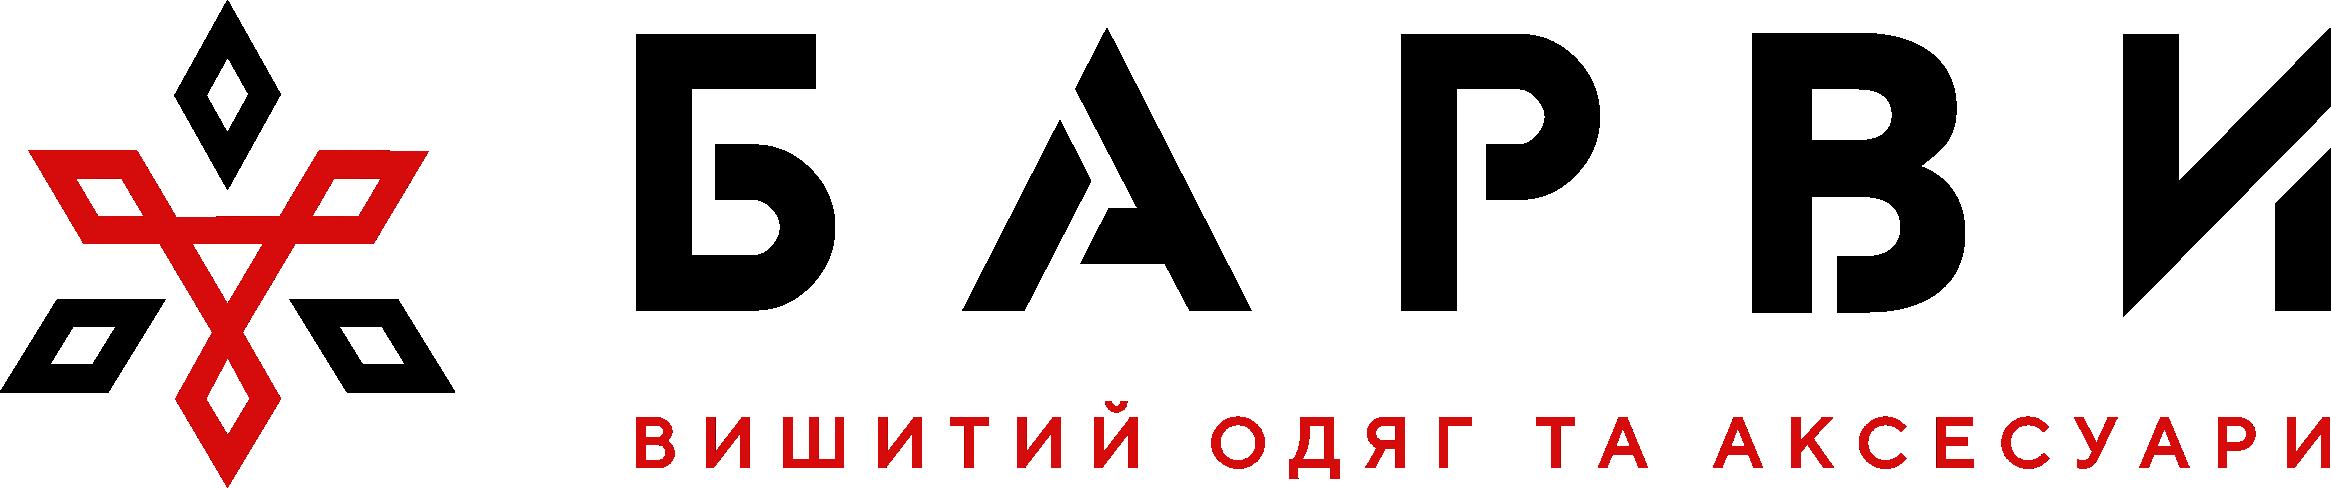 Vyshyvanka-barvy магазин вишиваного одягу